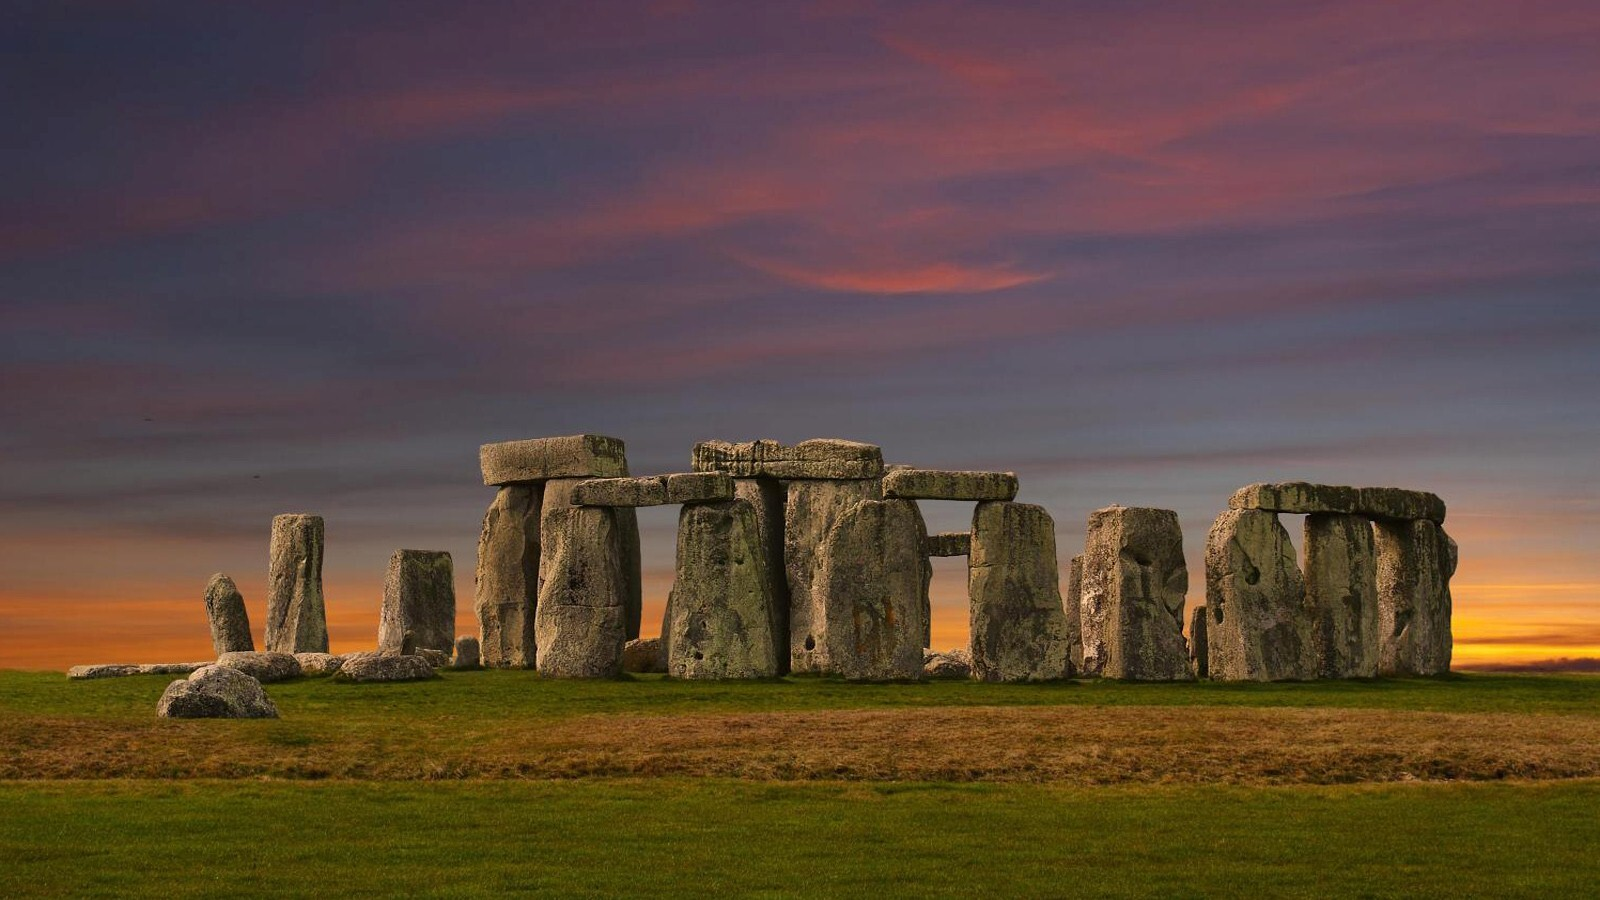 Stonehenge Historical Landmark in UK | HD Wallpapers